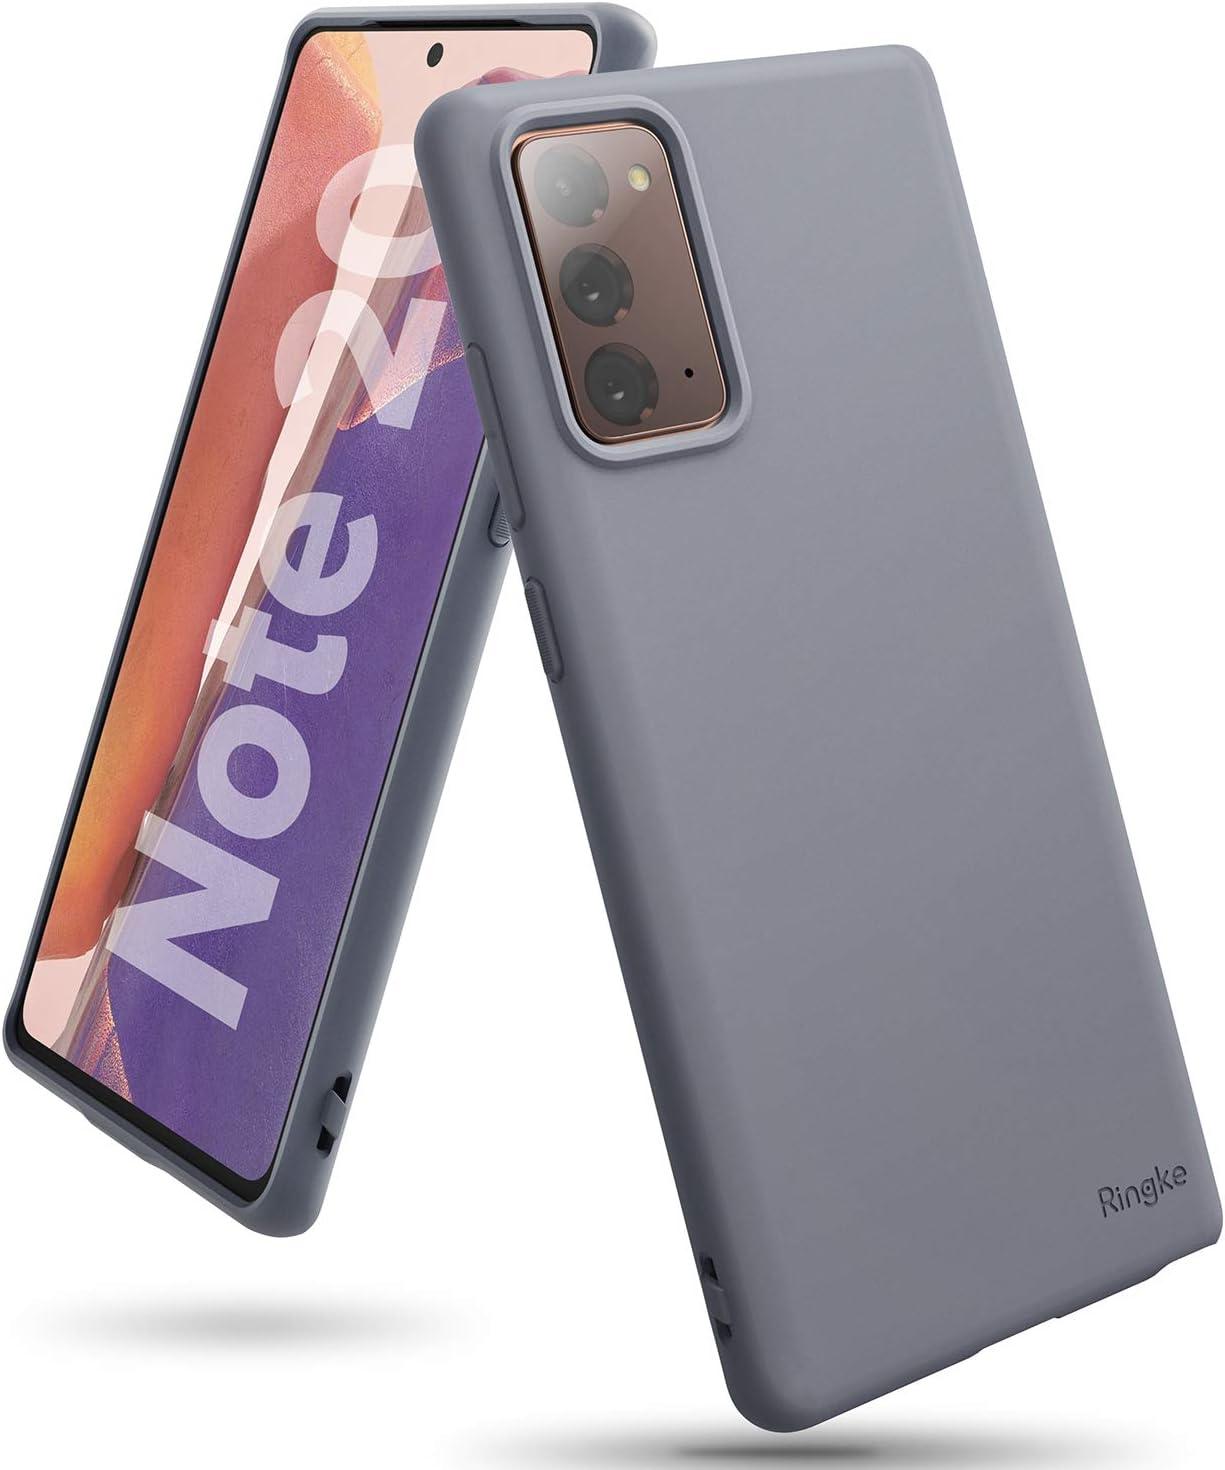 4. Ringke Air-S Samsung Galaxy Note 20 Case